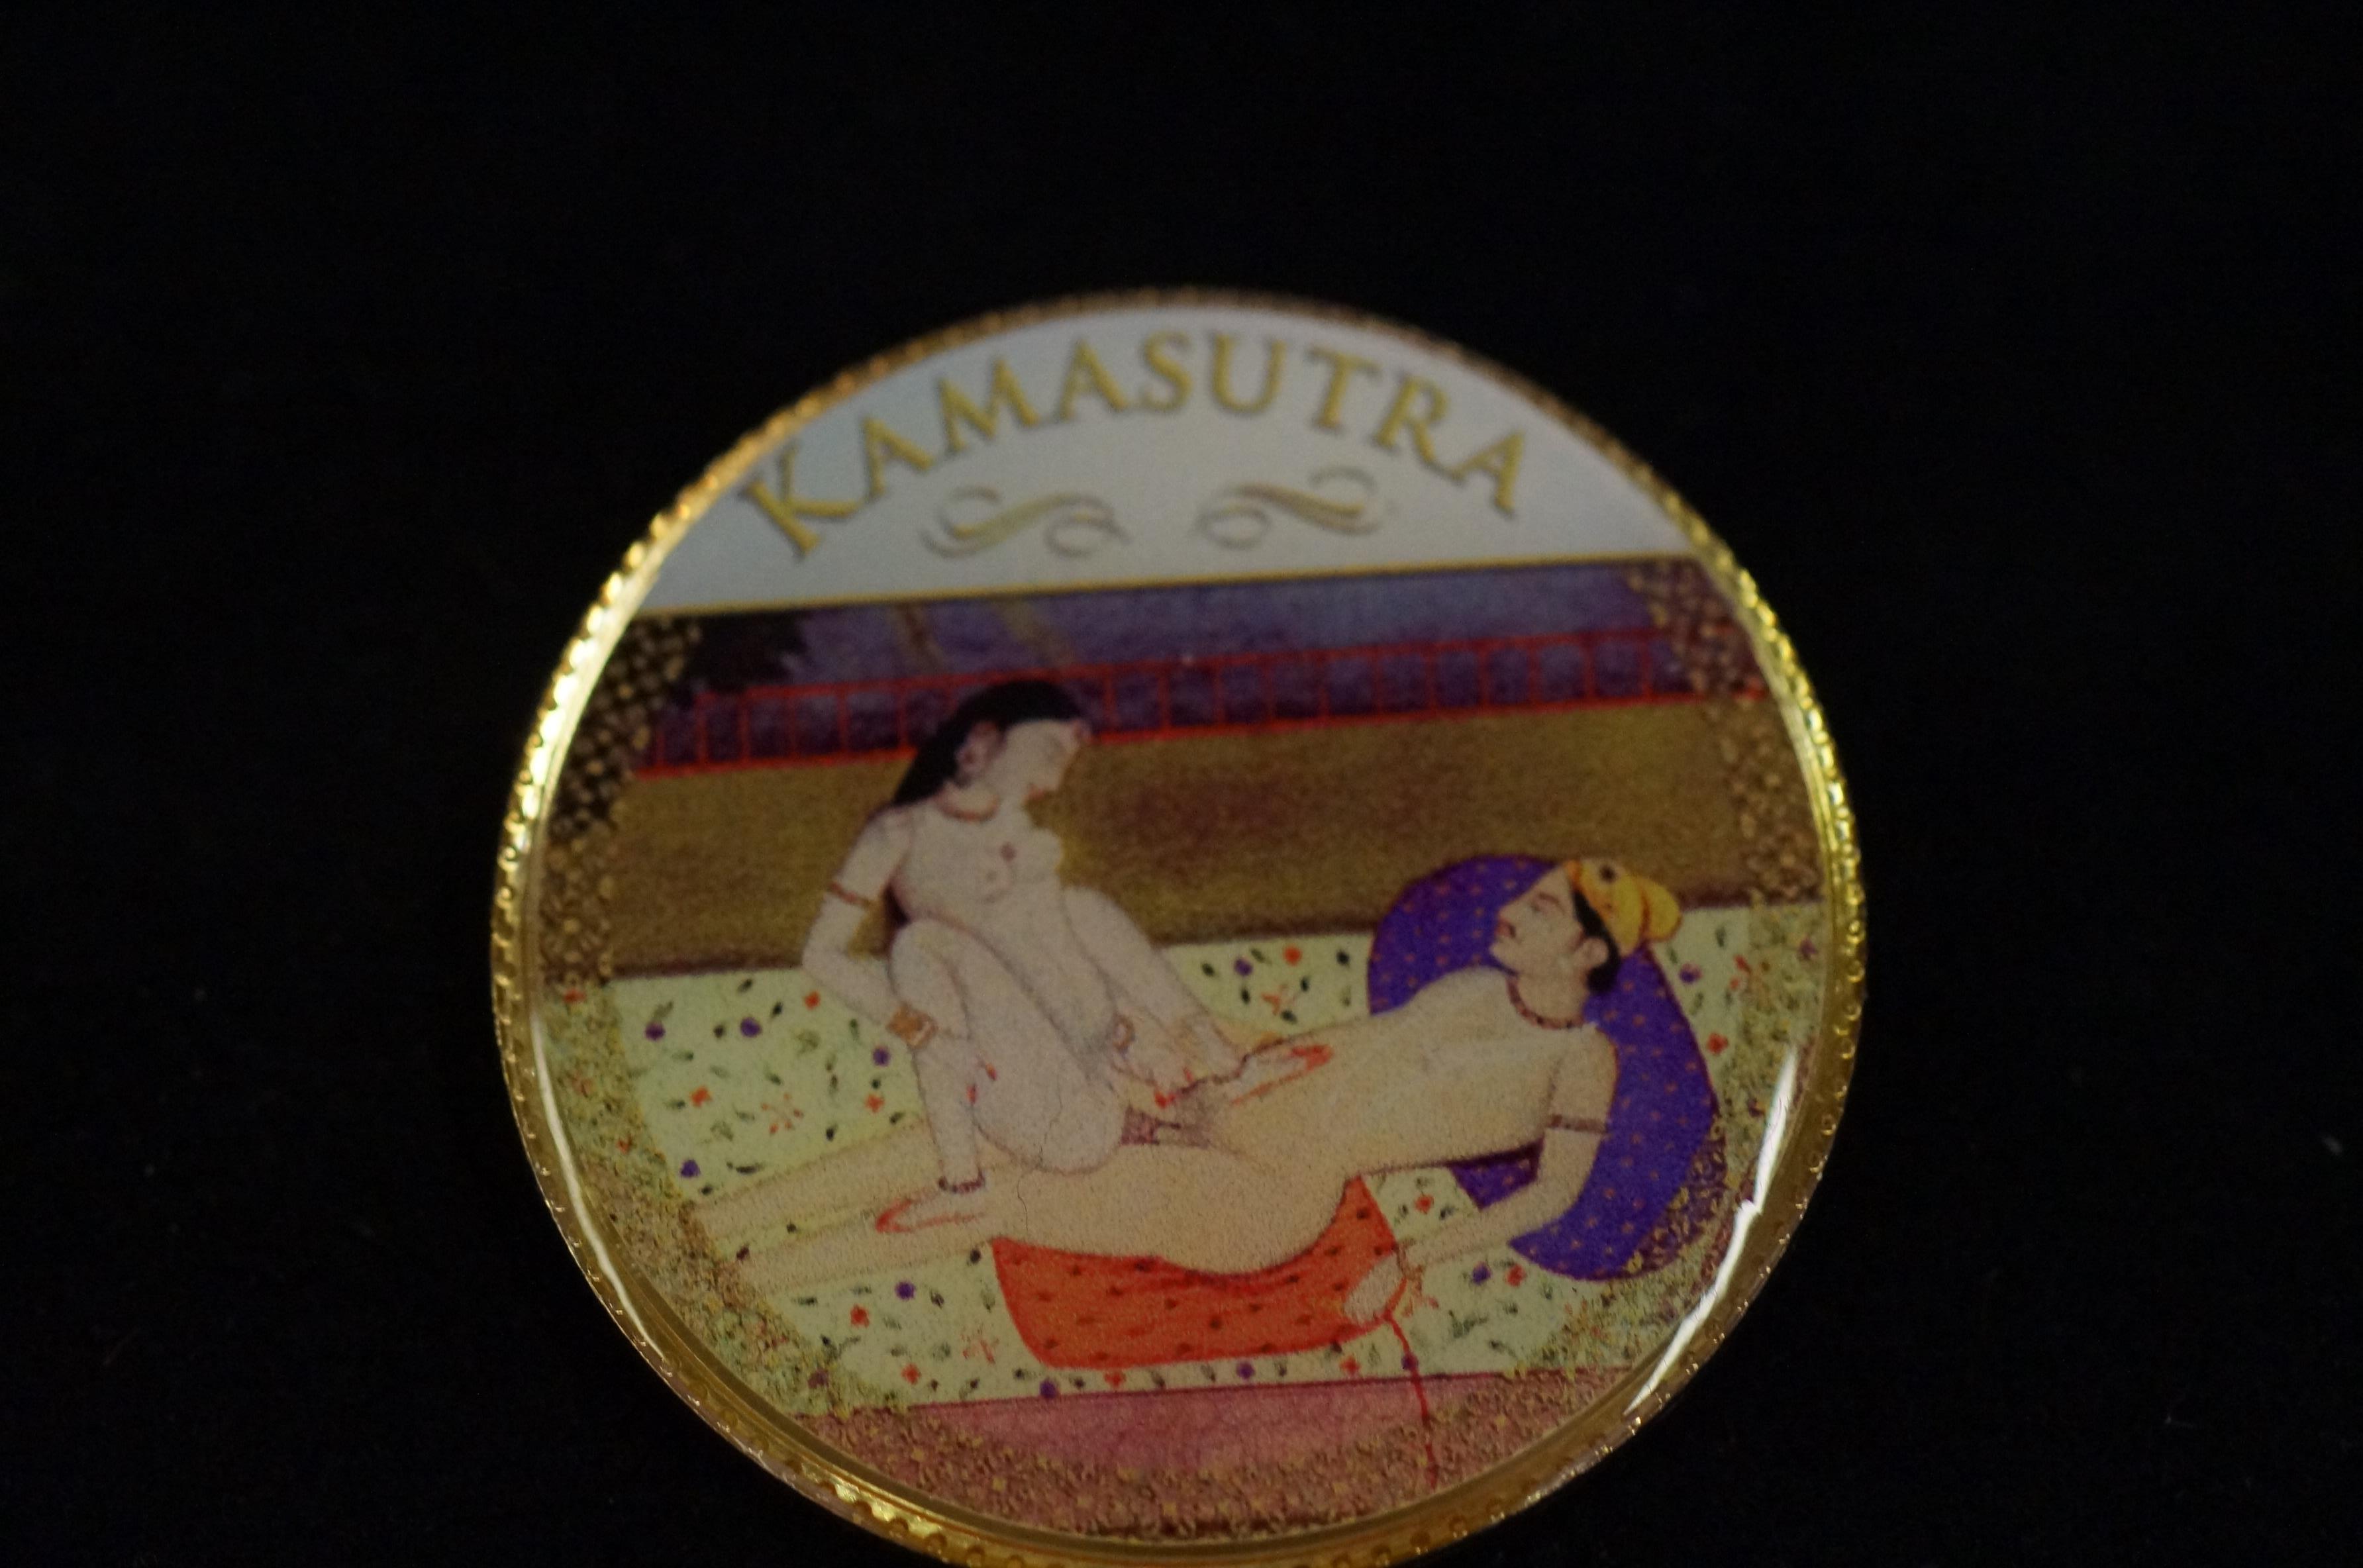 Kamasutra medallion